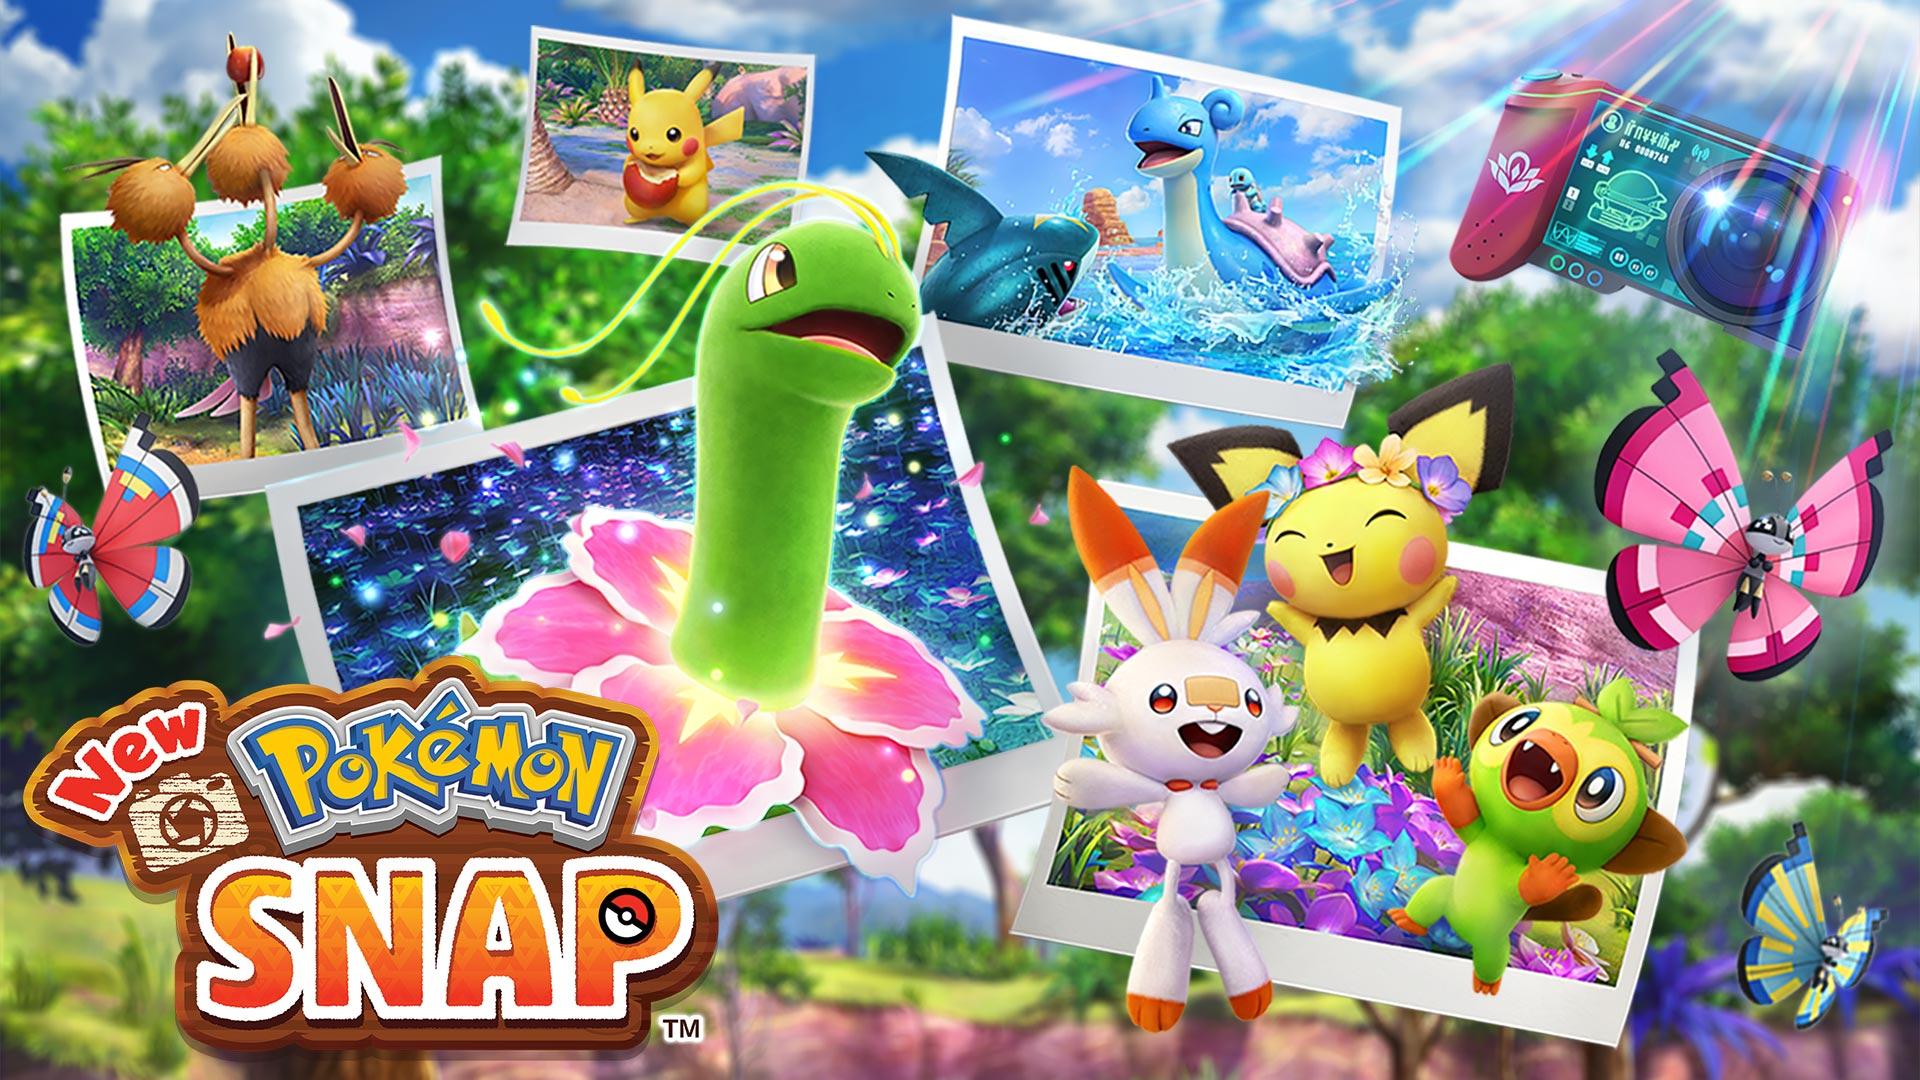 Pokemon Snap Gets New Extensive Trailer Showcasing New Pokemon